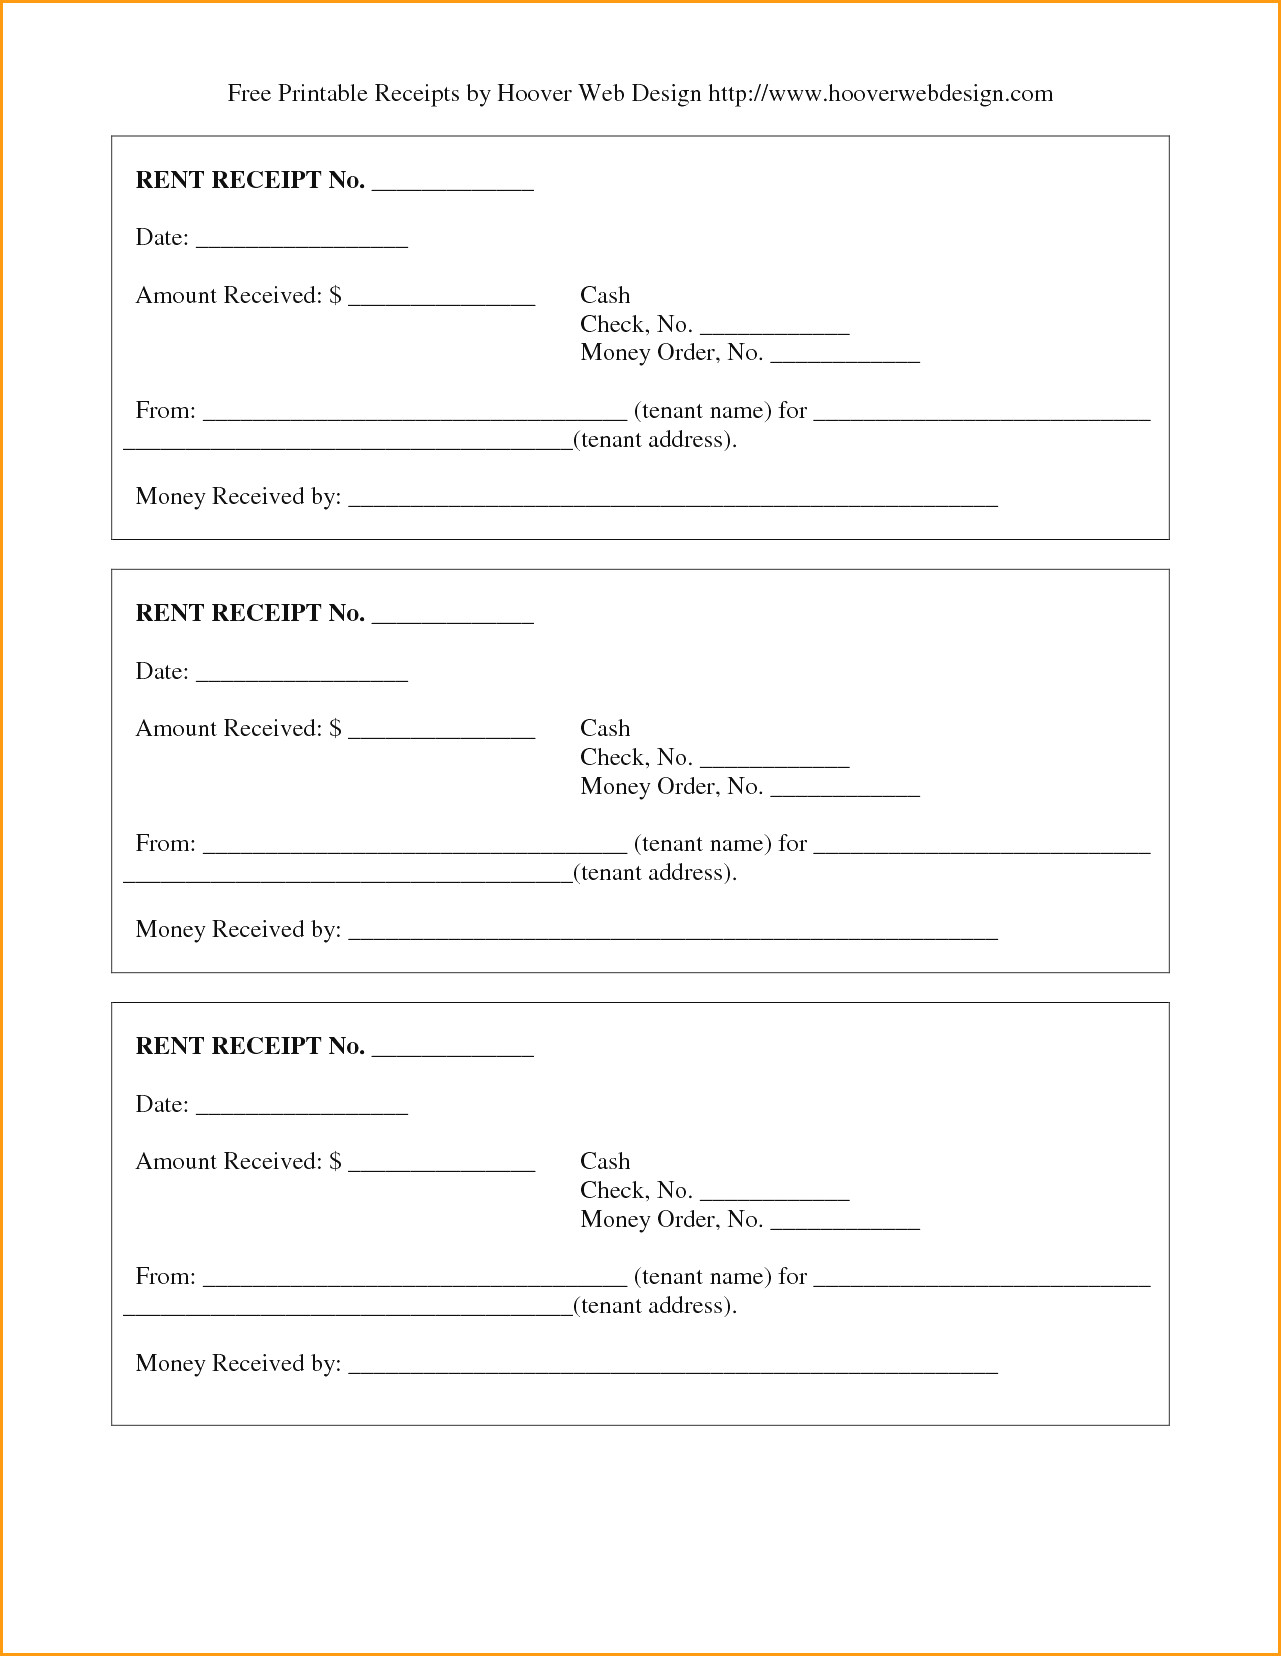 Free Printable Rent Receipts Filename   Colorium Laboratorium - Free Printable Rent Receipt